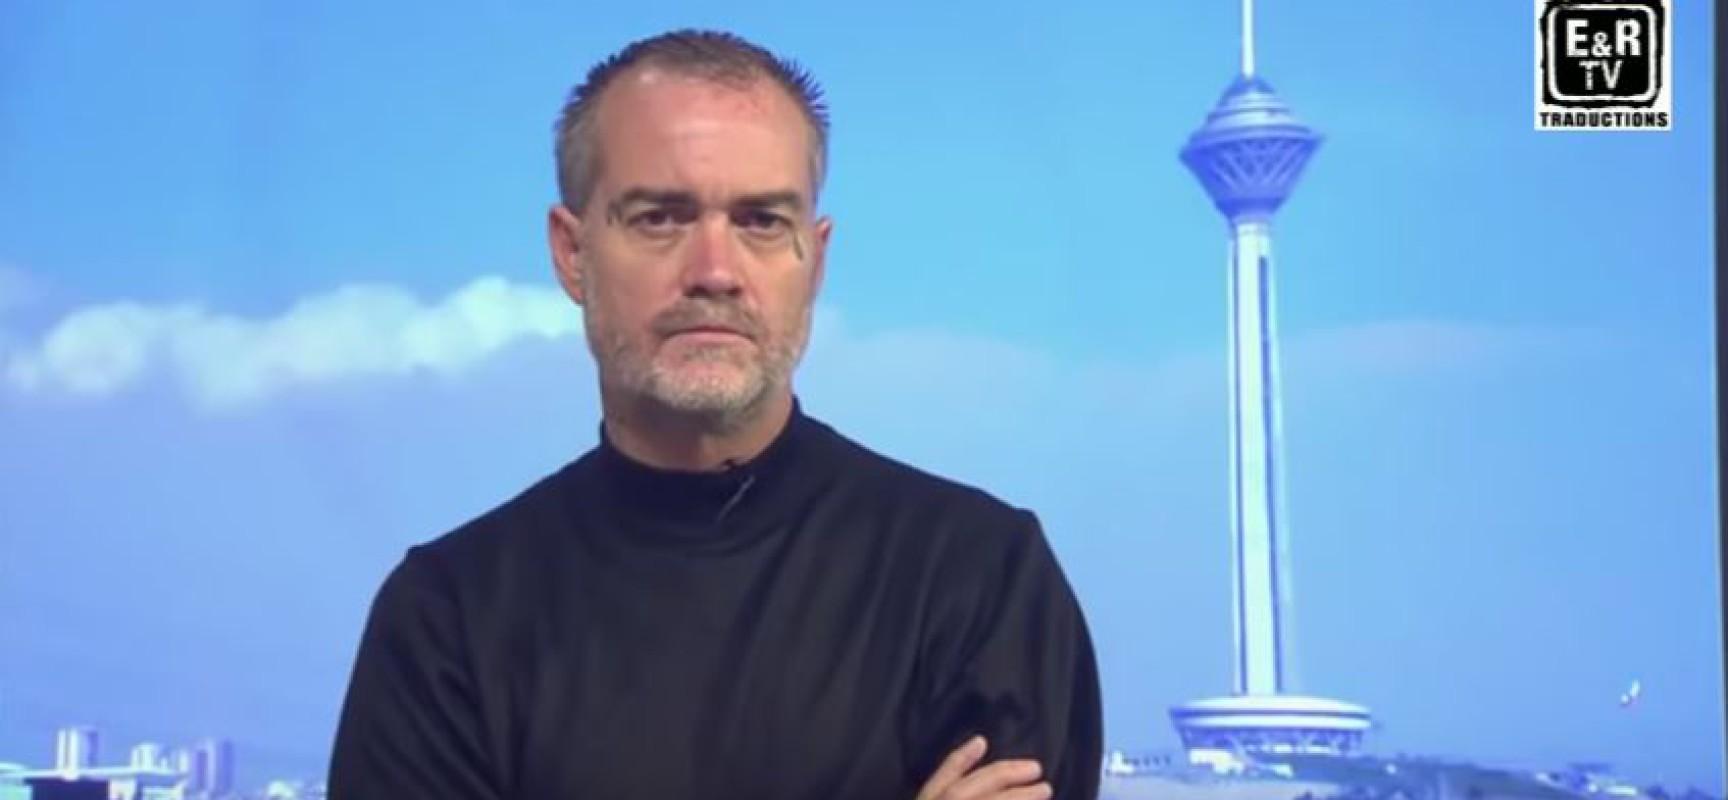 Ken O'Keefe, un vétéran de la guerre du Golfe : la «guerre contre Daech» est un tissu de mensonges